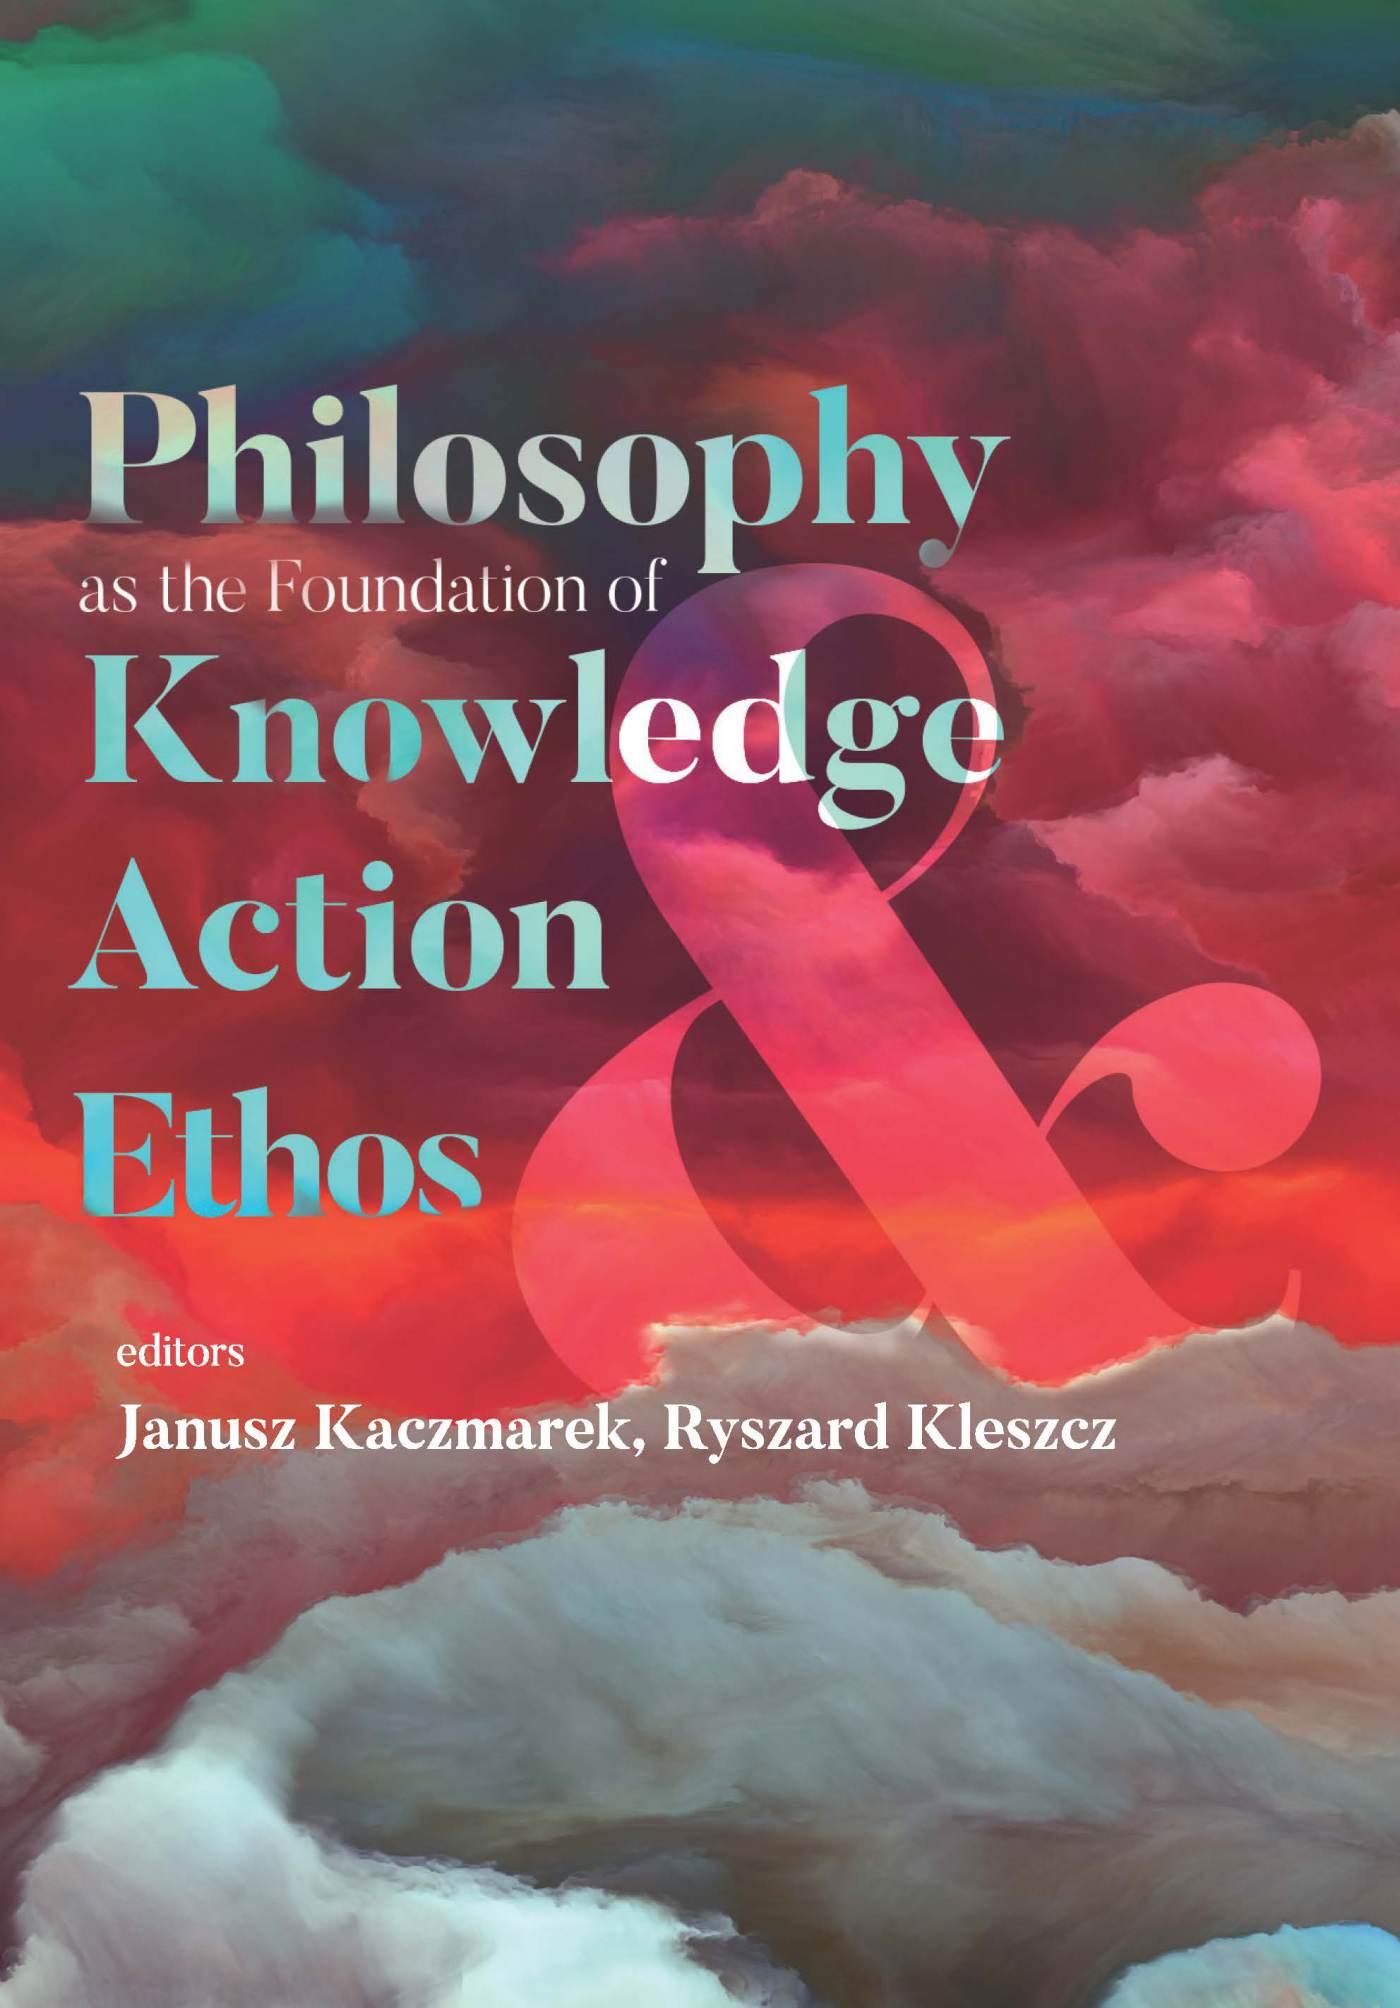 Philosophy as the Foundation of Knowledge, Action and Ethos - Ebook (Książka PDF) do pobrania w formacie PDF